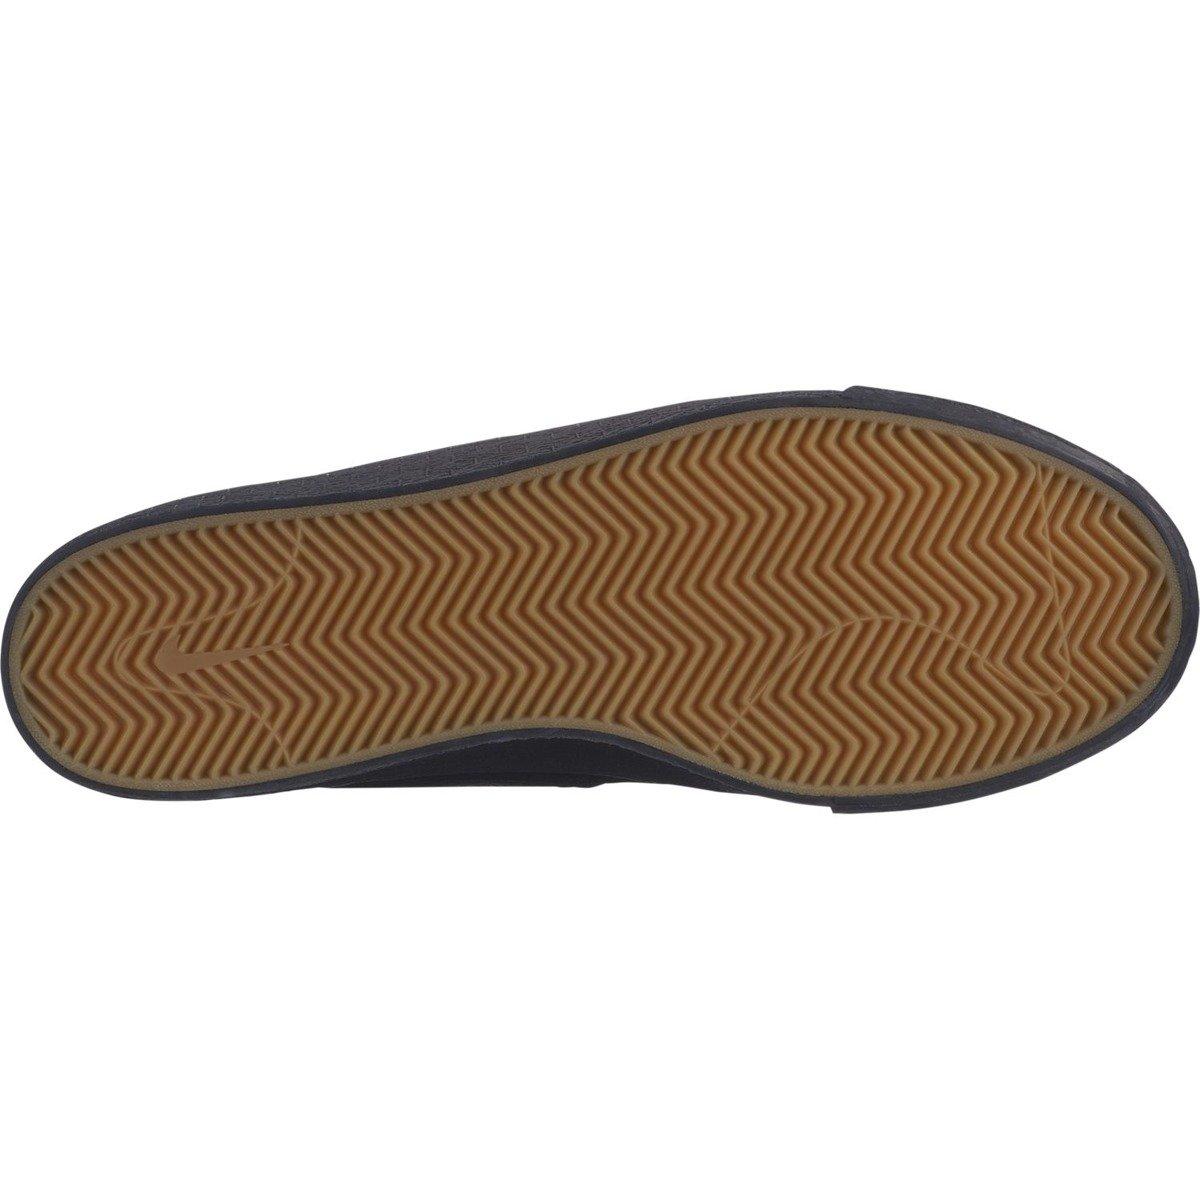 new product d3ff9 c77e1 shoes Nike SB Zoom Blazer Chukka XT Premium BLACK/BLACK